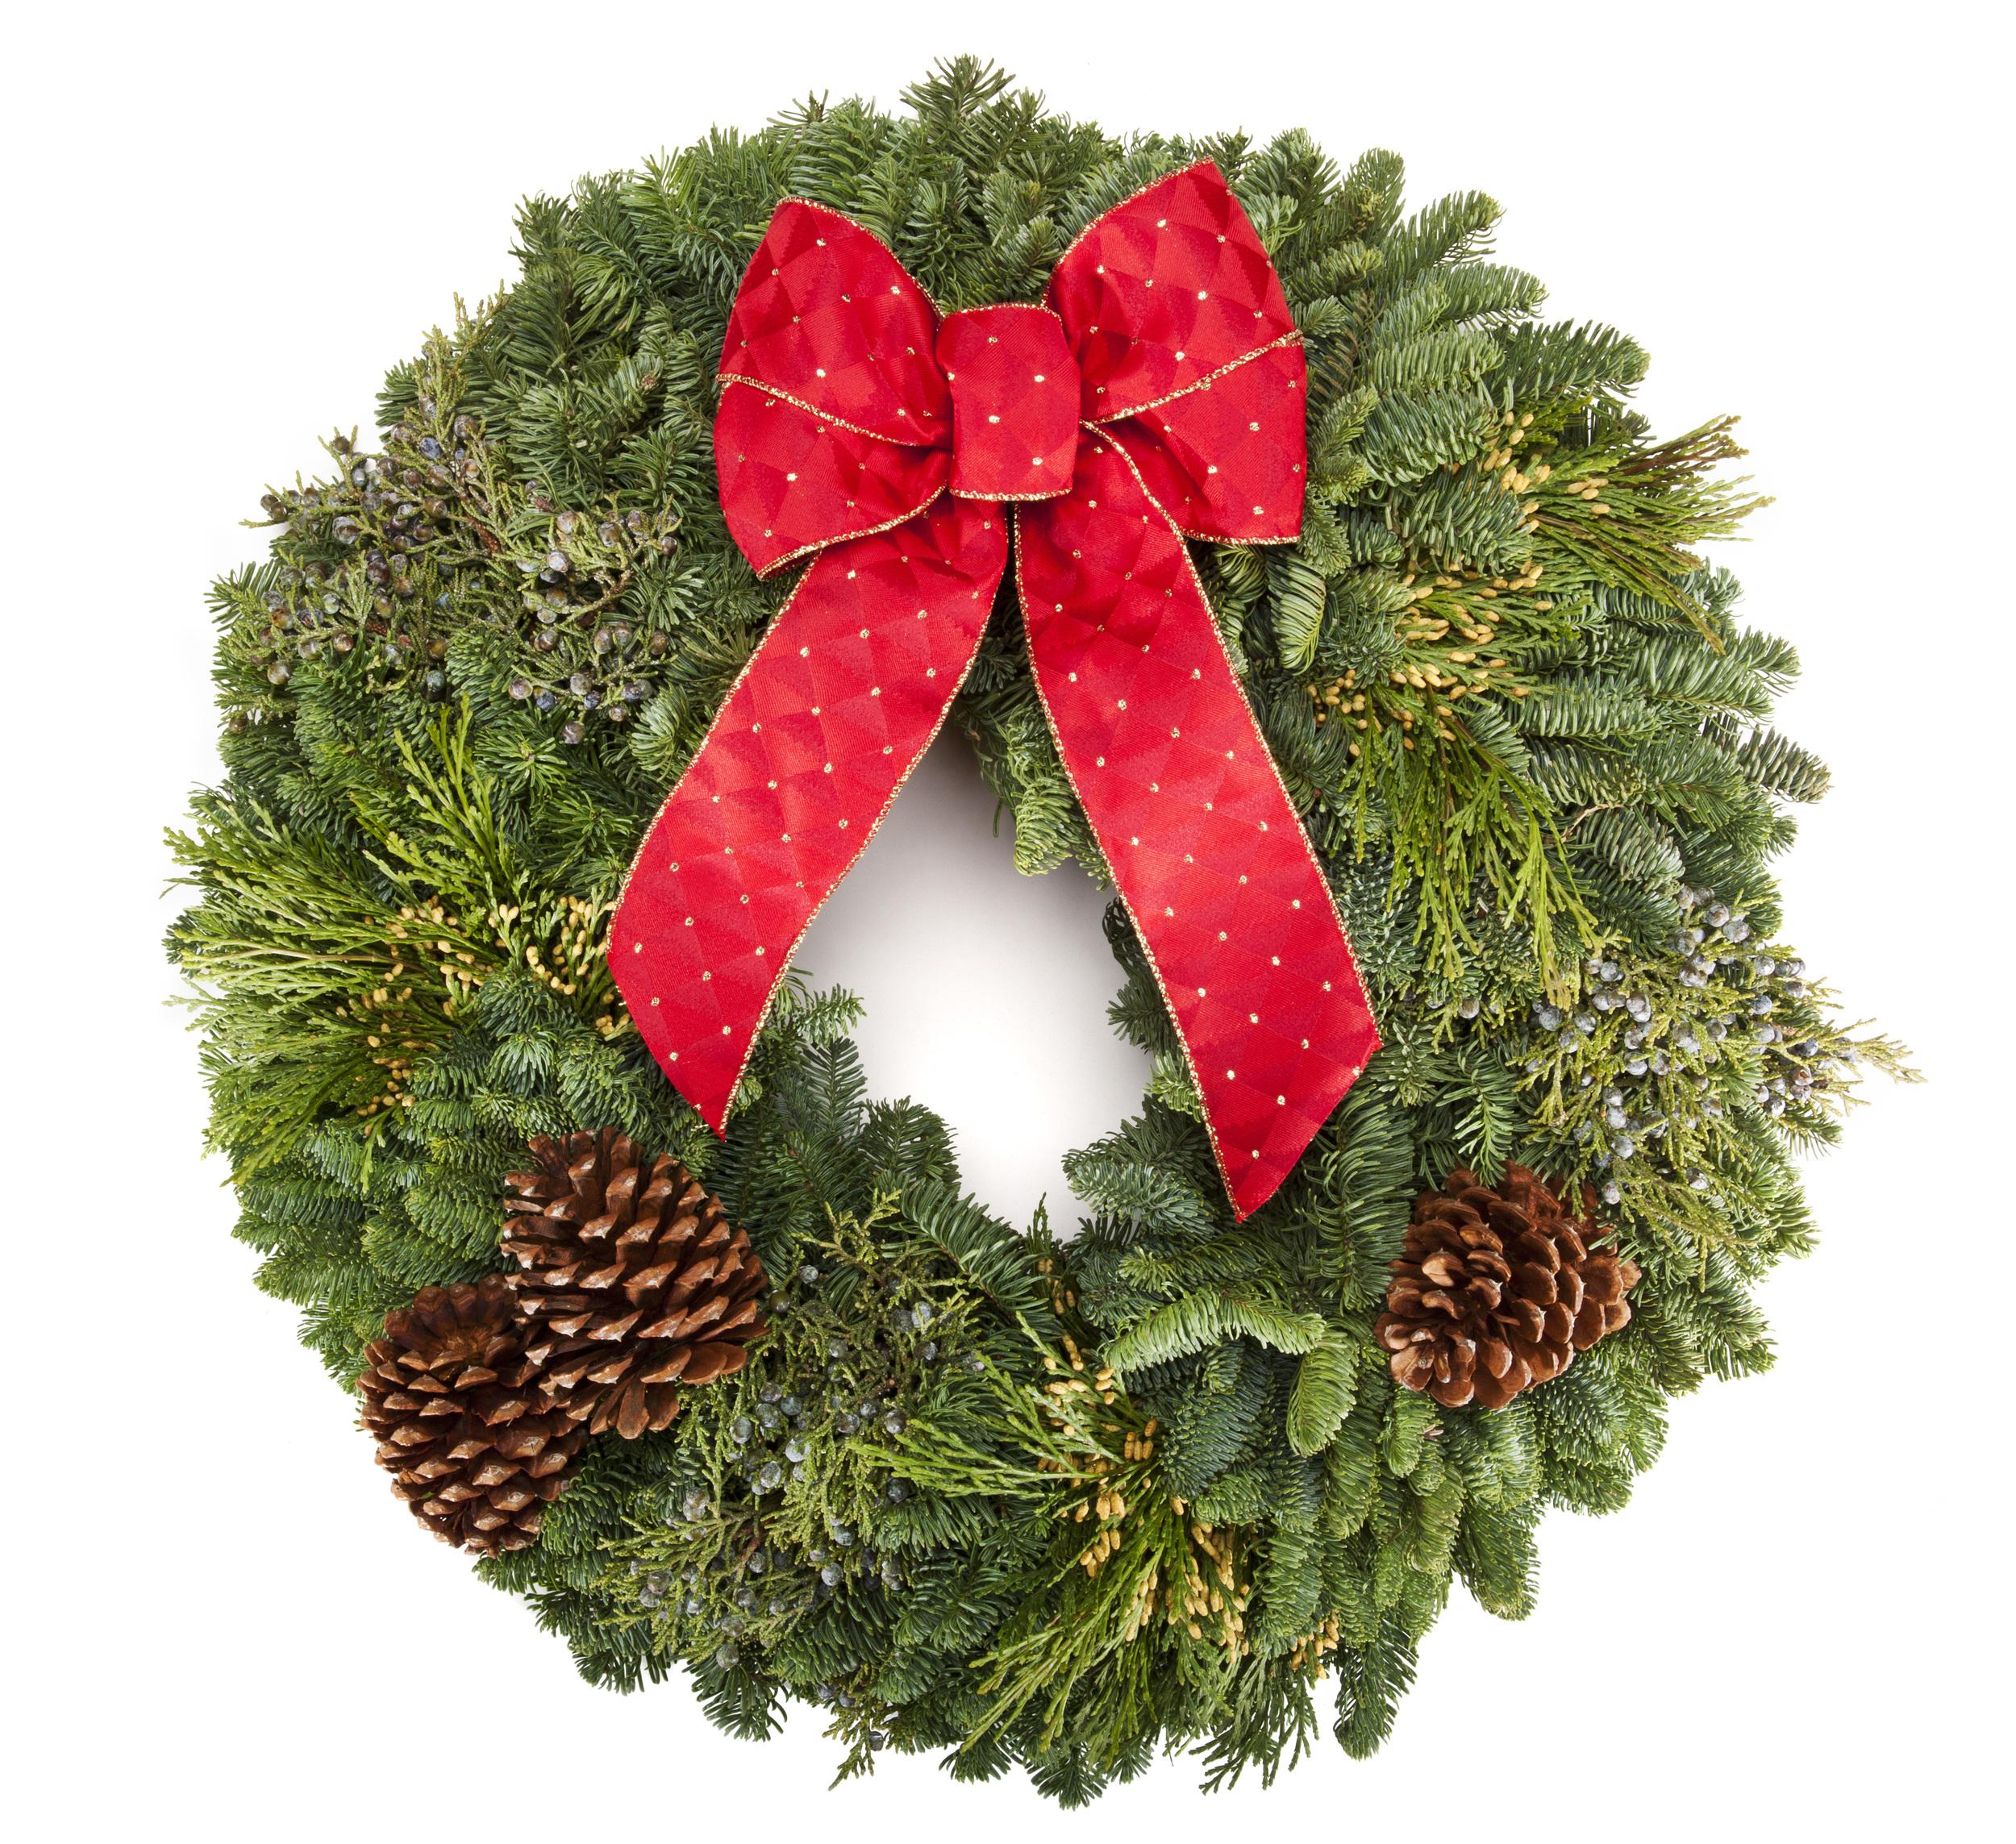 "Granstrom Evergreens 22"" Mixed Evergreen Christmas Wreath"